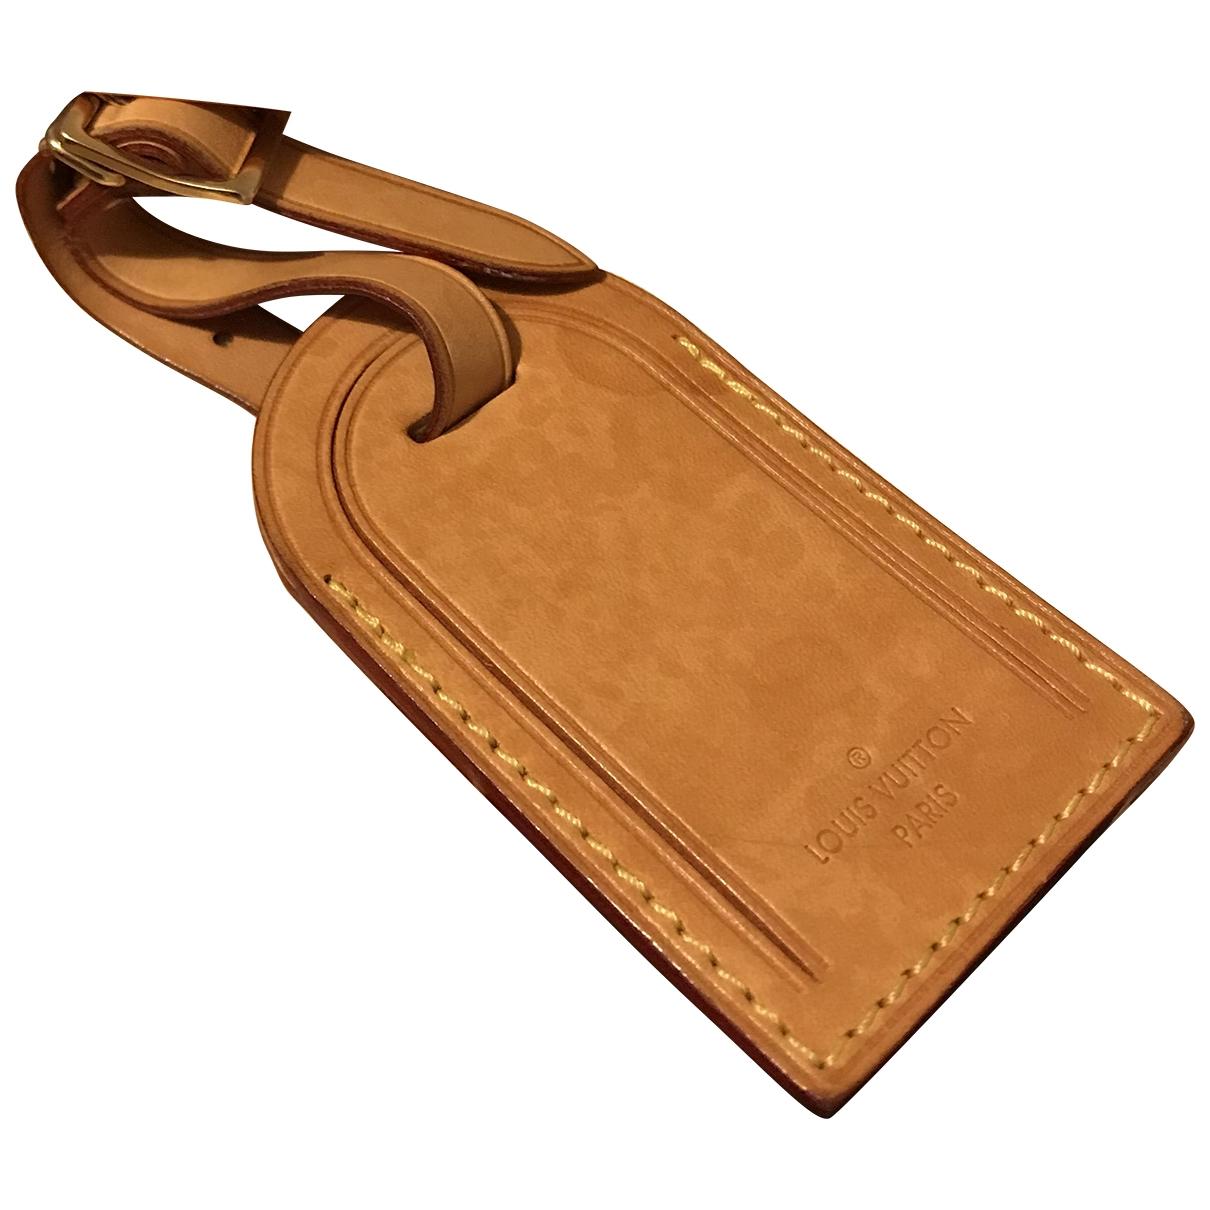 Louis Vuitton Porte adresse Beige Leather Purses, wallet & cases for Women \N